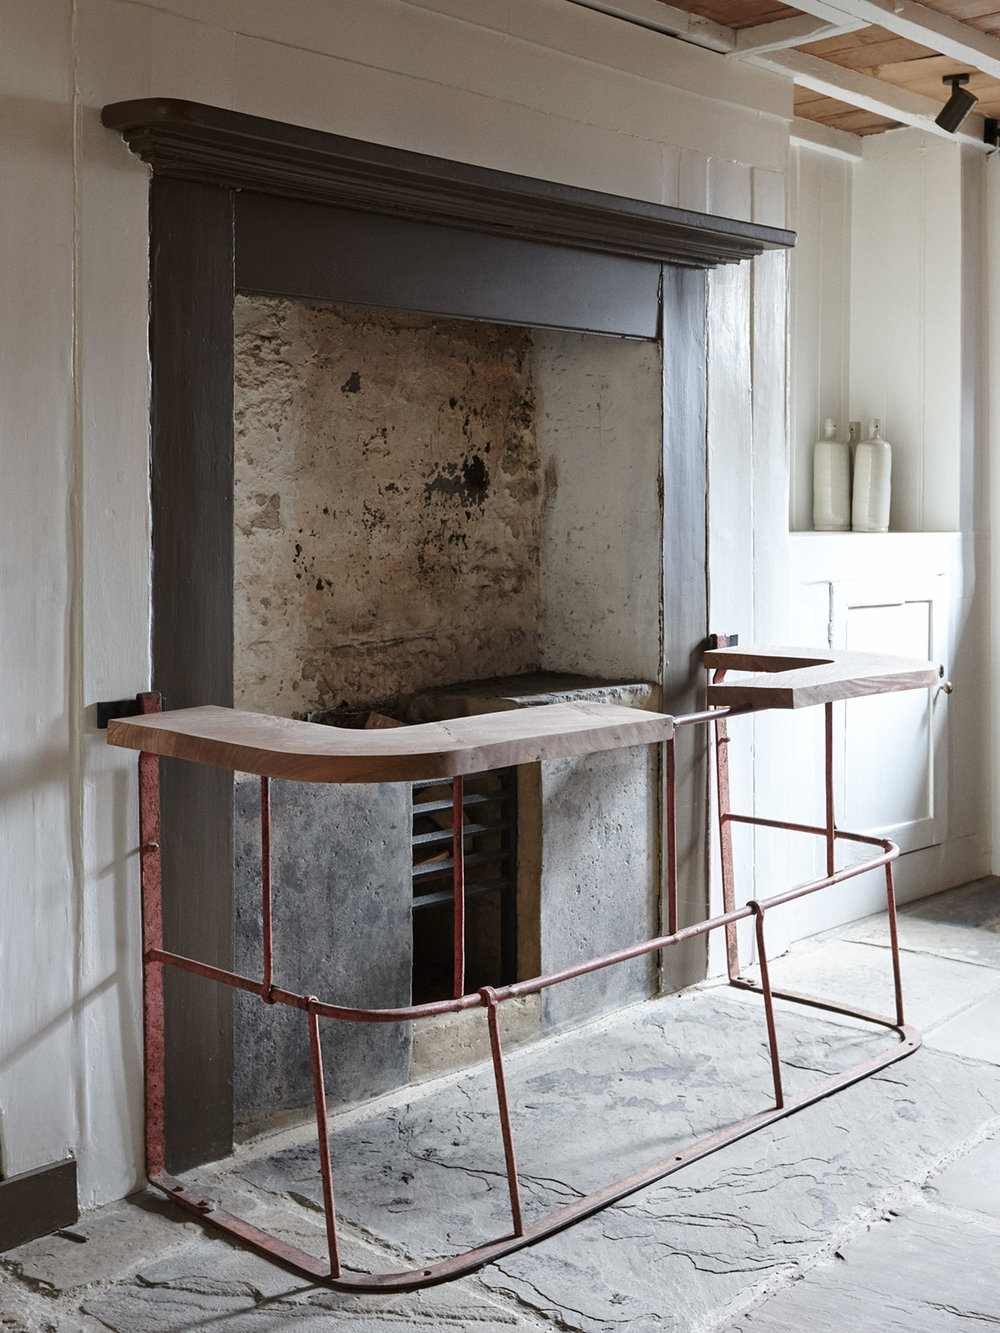 Newroad-Residence-London-Remodelista-4A.jpg